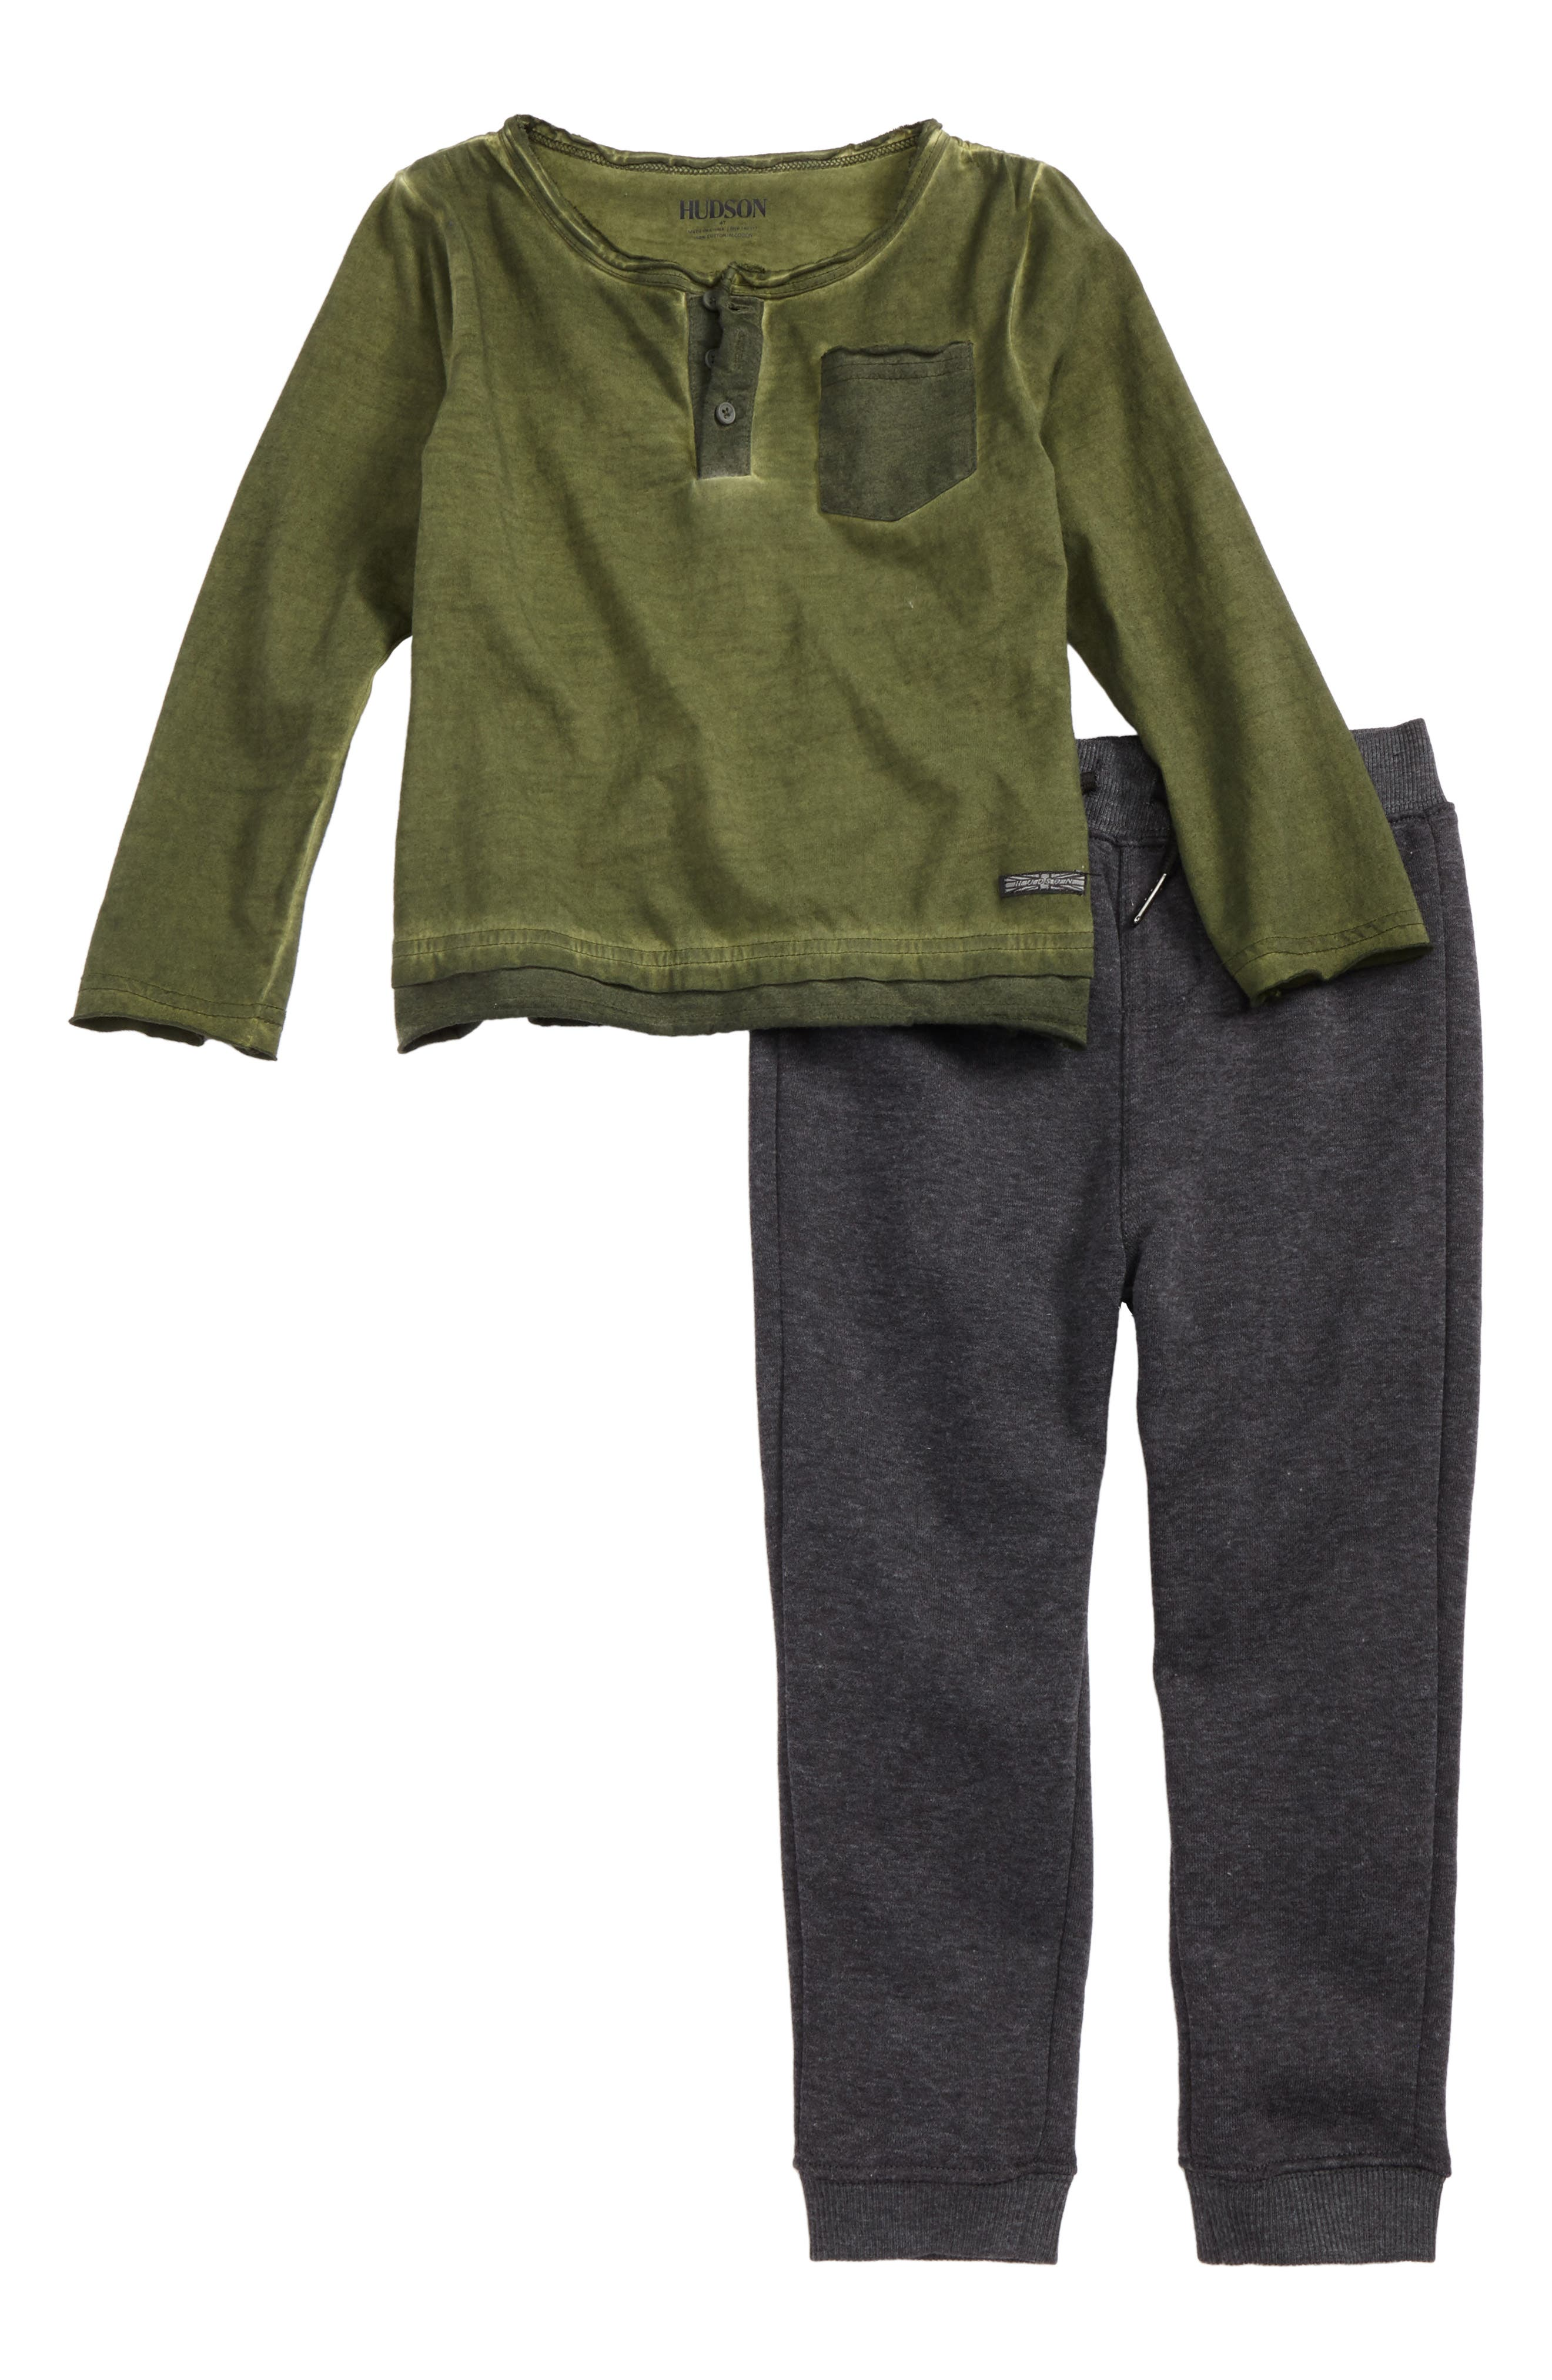 Alternate Image 1 Selected - Hudson Kids Henley Top & Sweatpants Set (Toddler Boys)